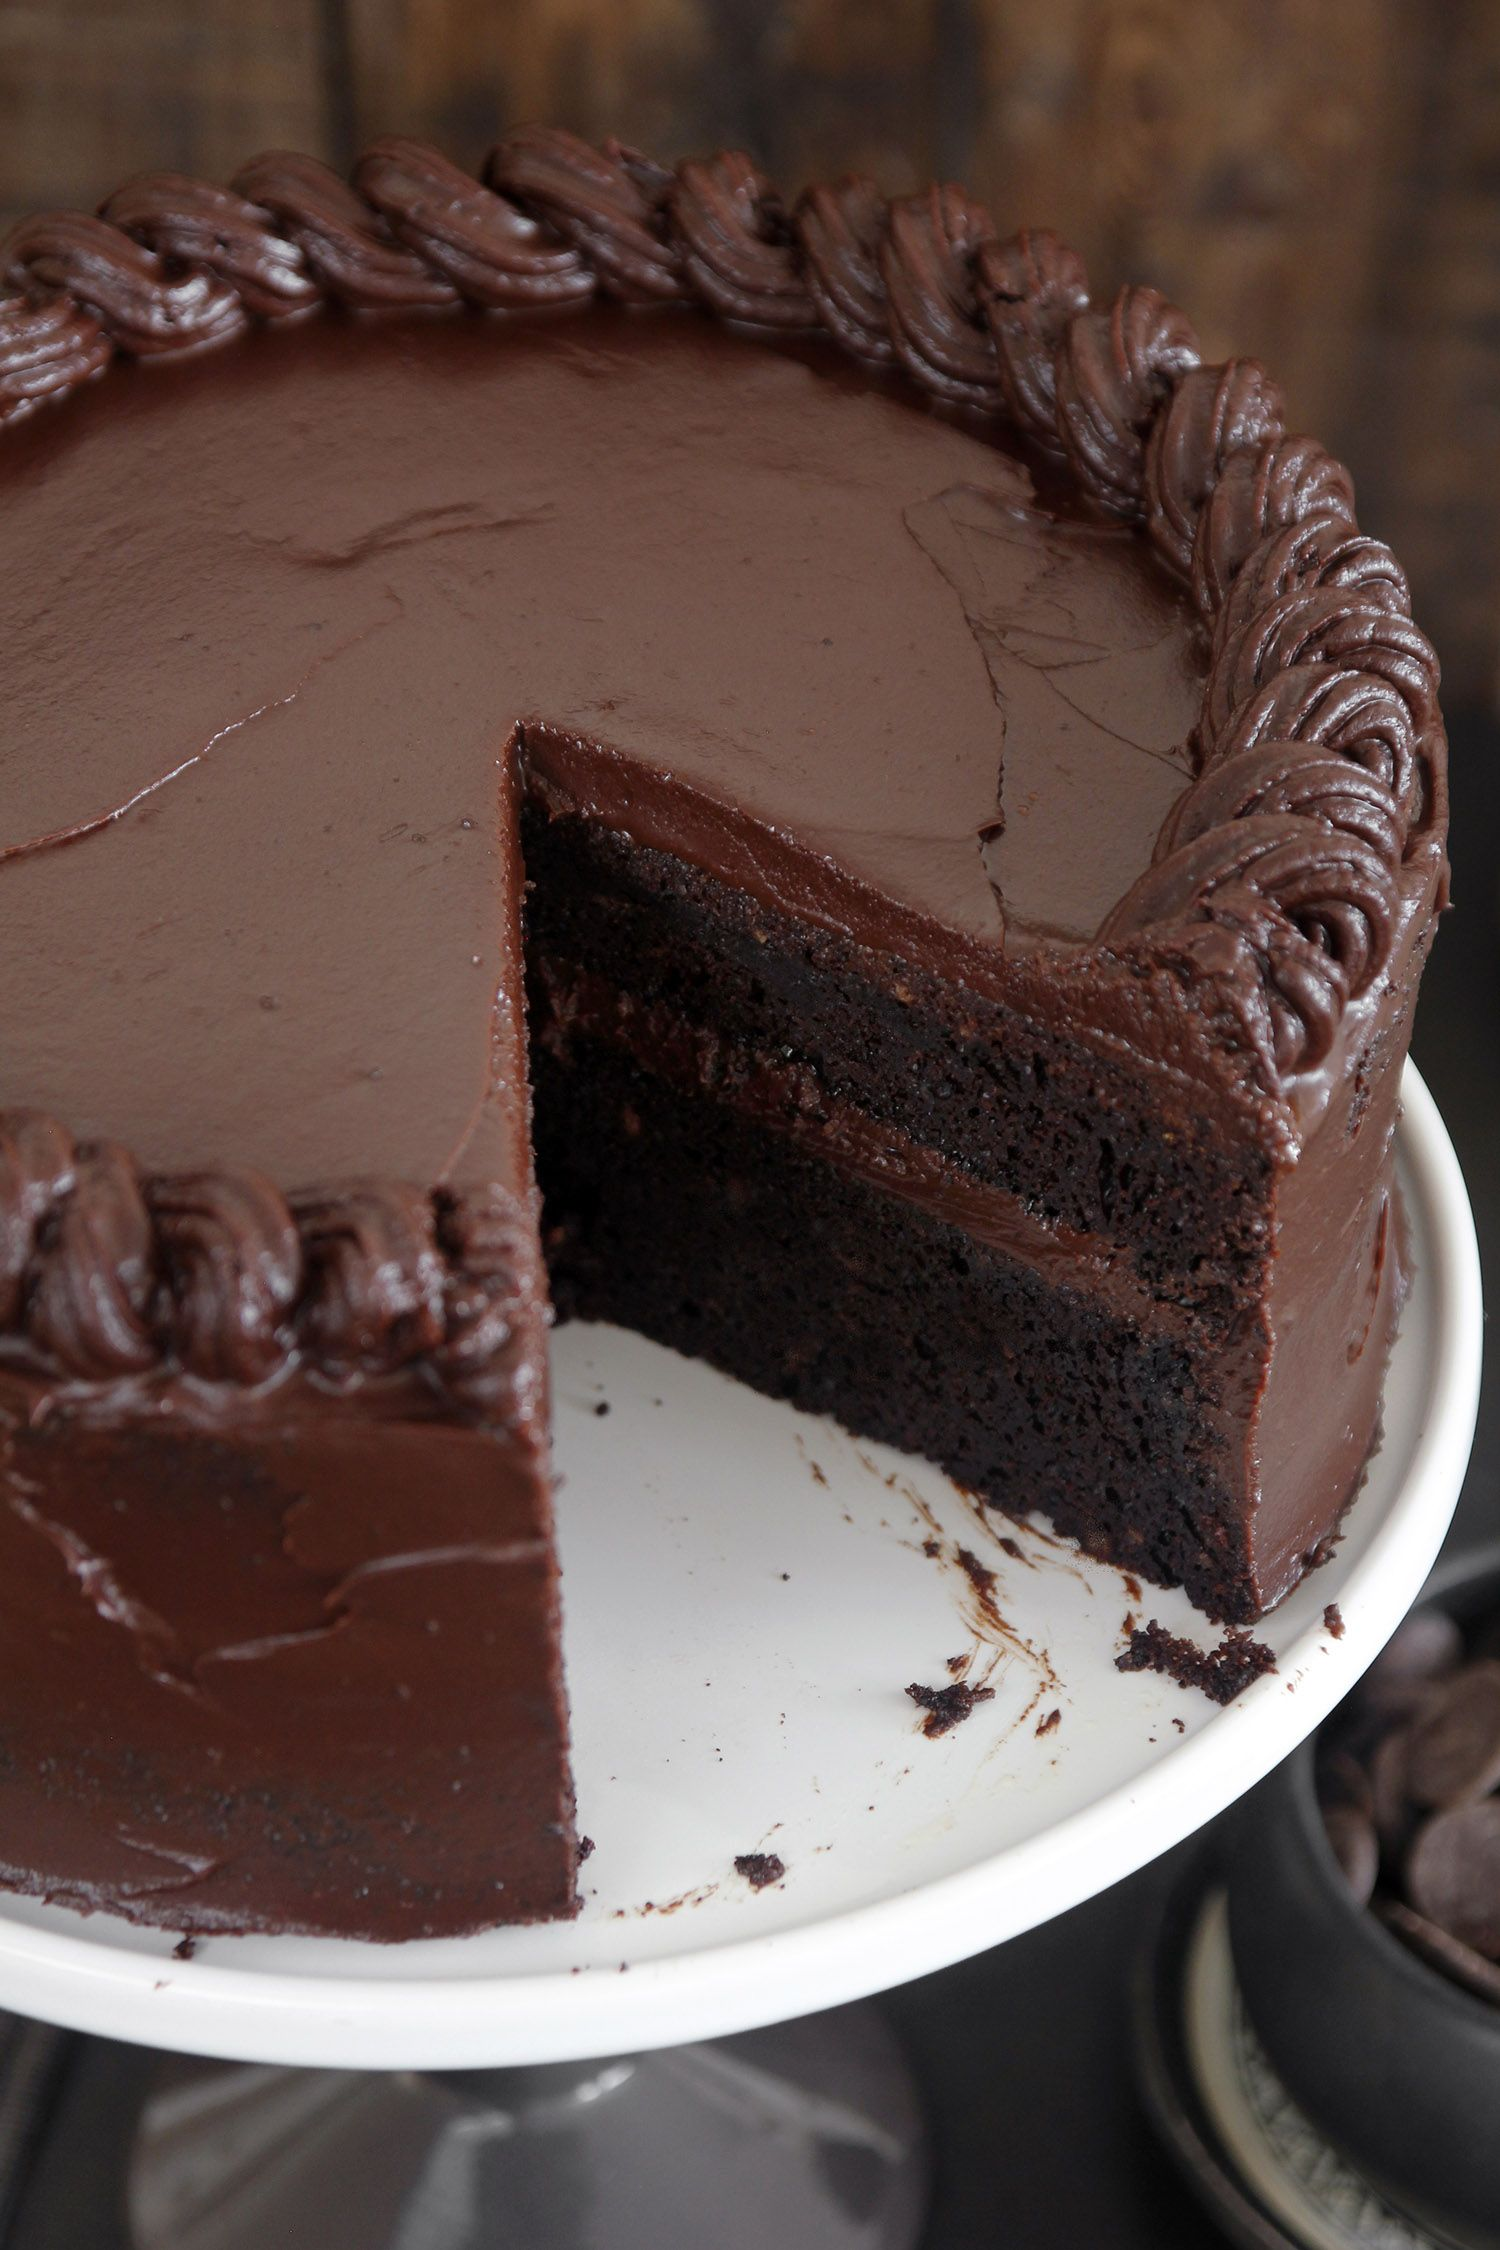 The Most Amazing Chocolate Cake Cake Recipes Amazing Chocolate Cake Recipe Chocolate Cake Recipe